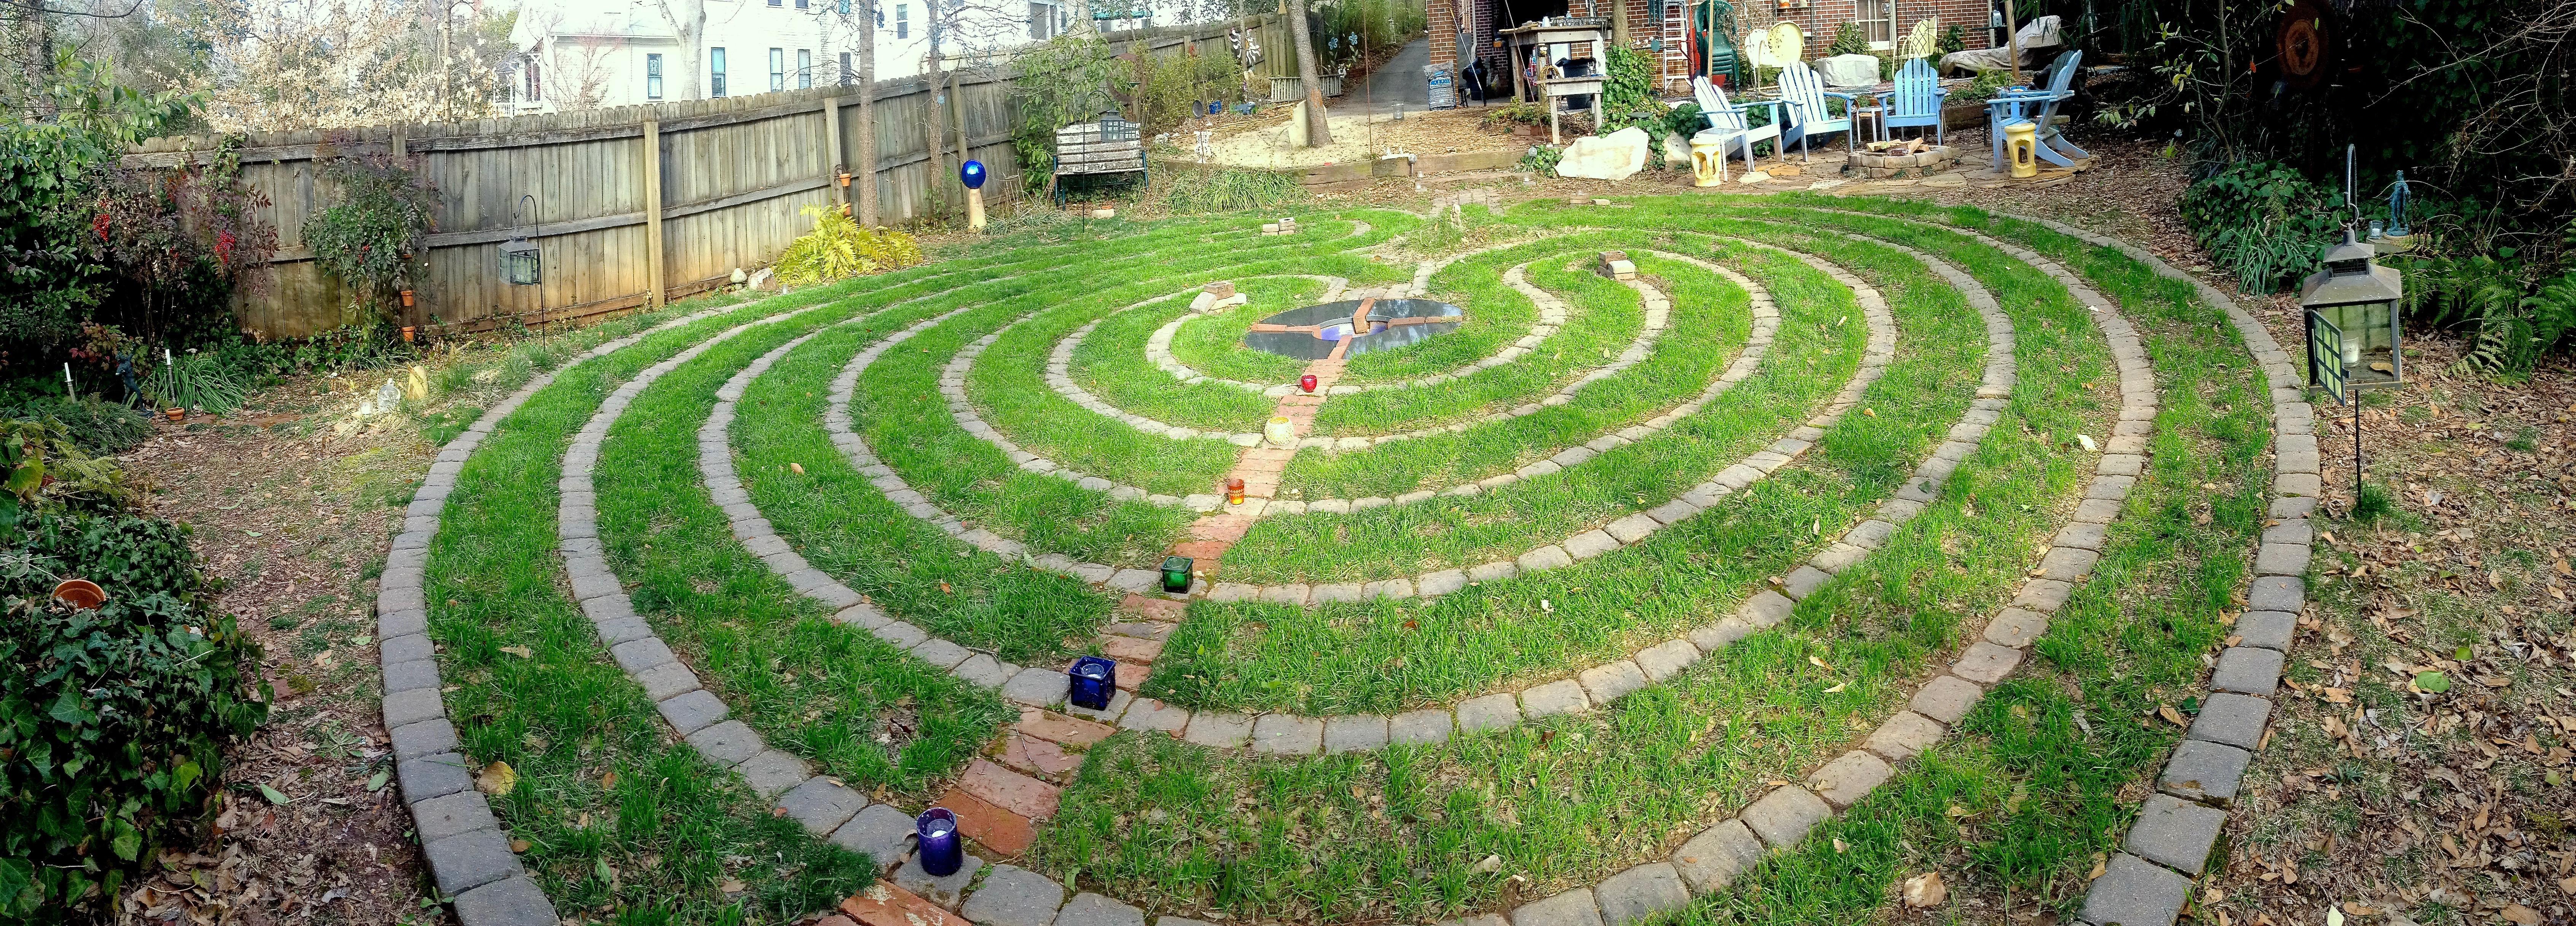 Lyles' Labyrinth